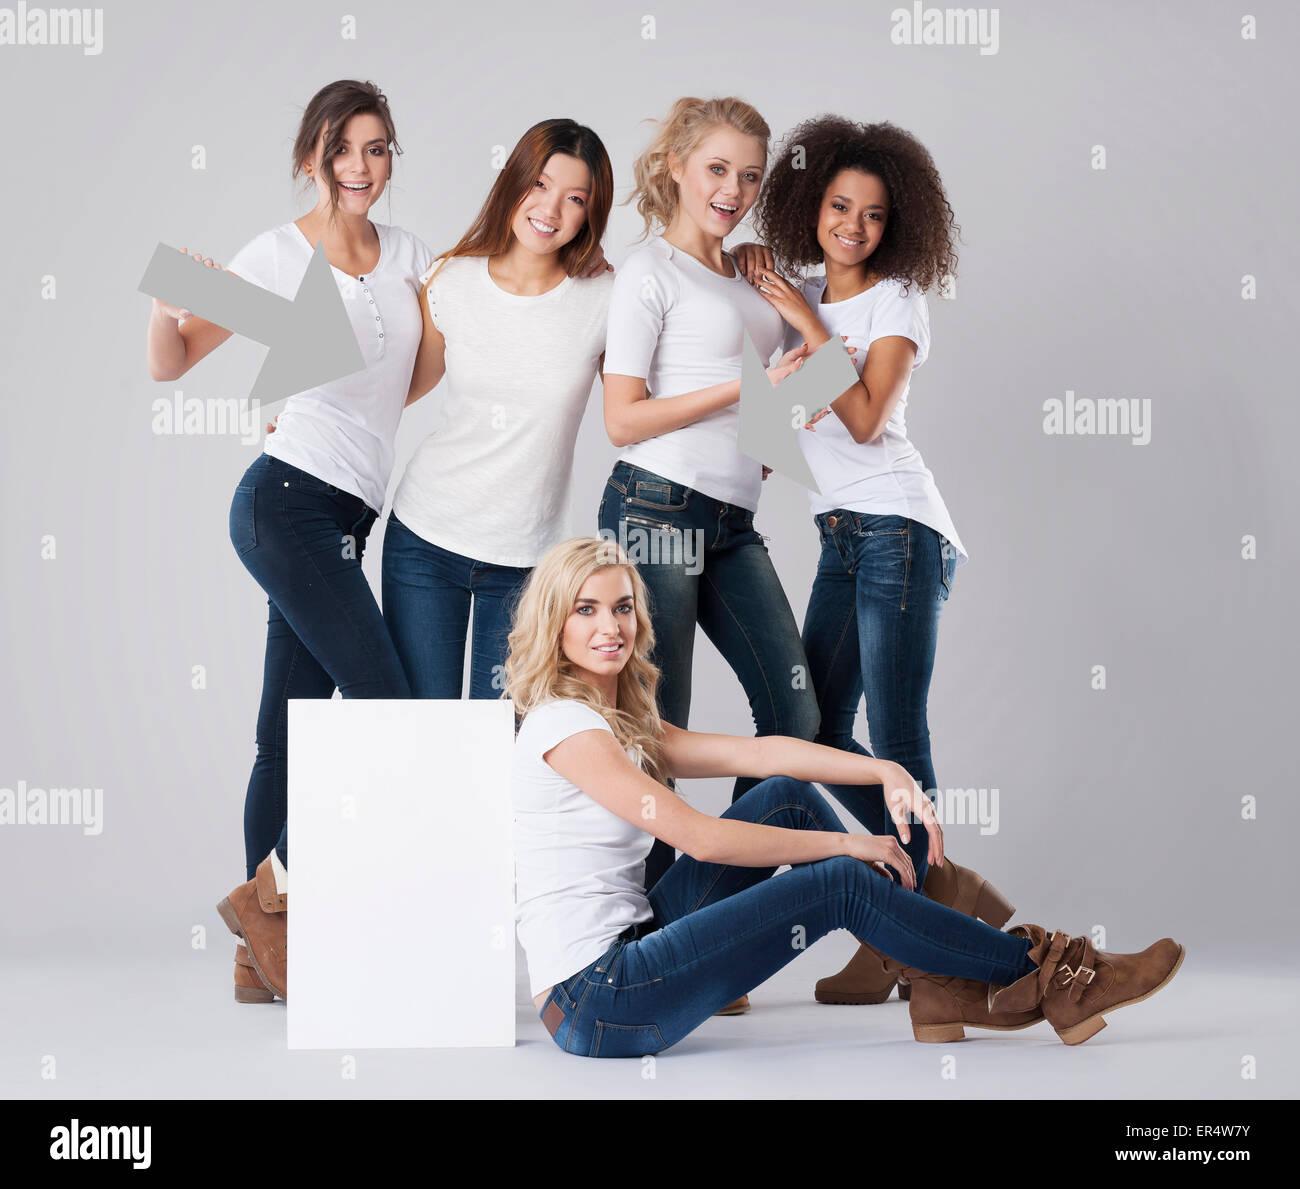 Multi-ethnic women displaying white board. Debica, Poland - Stock Image